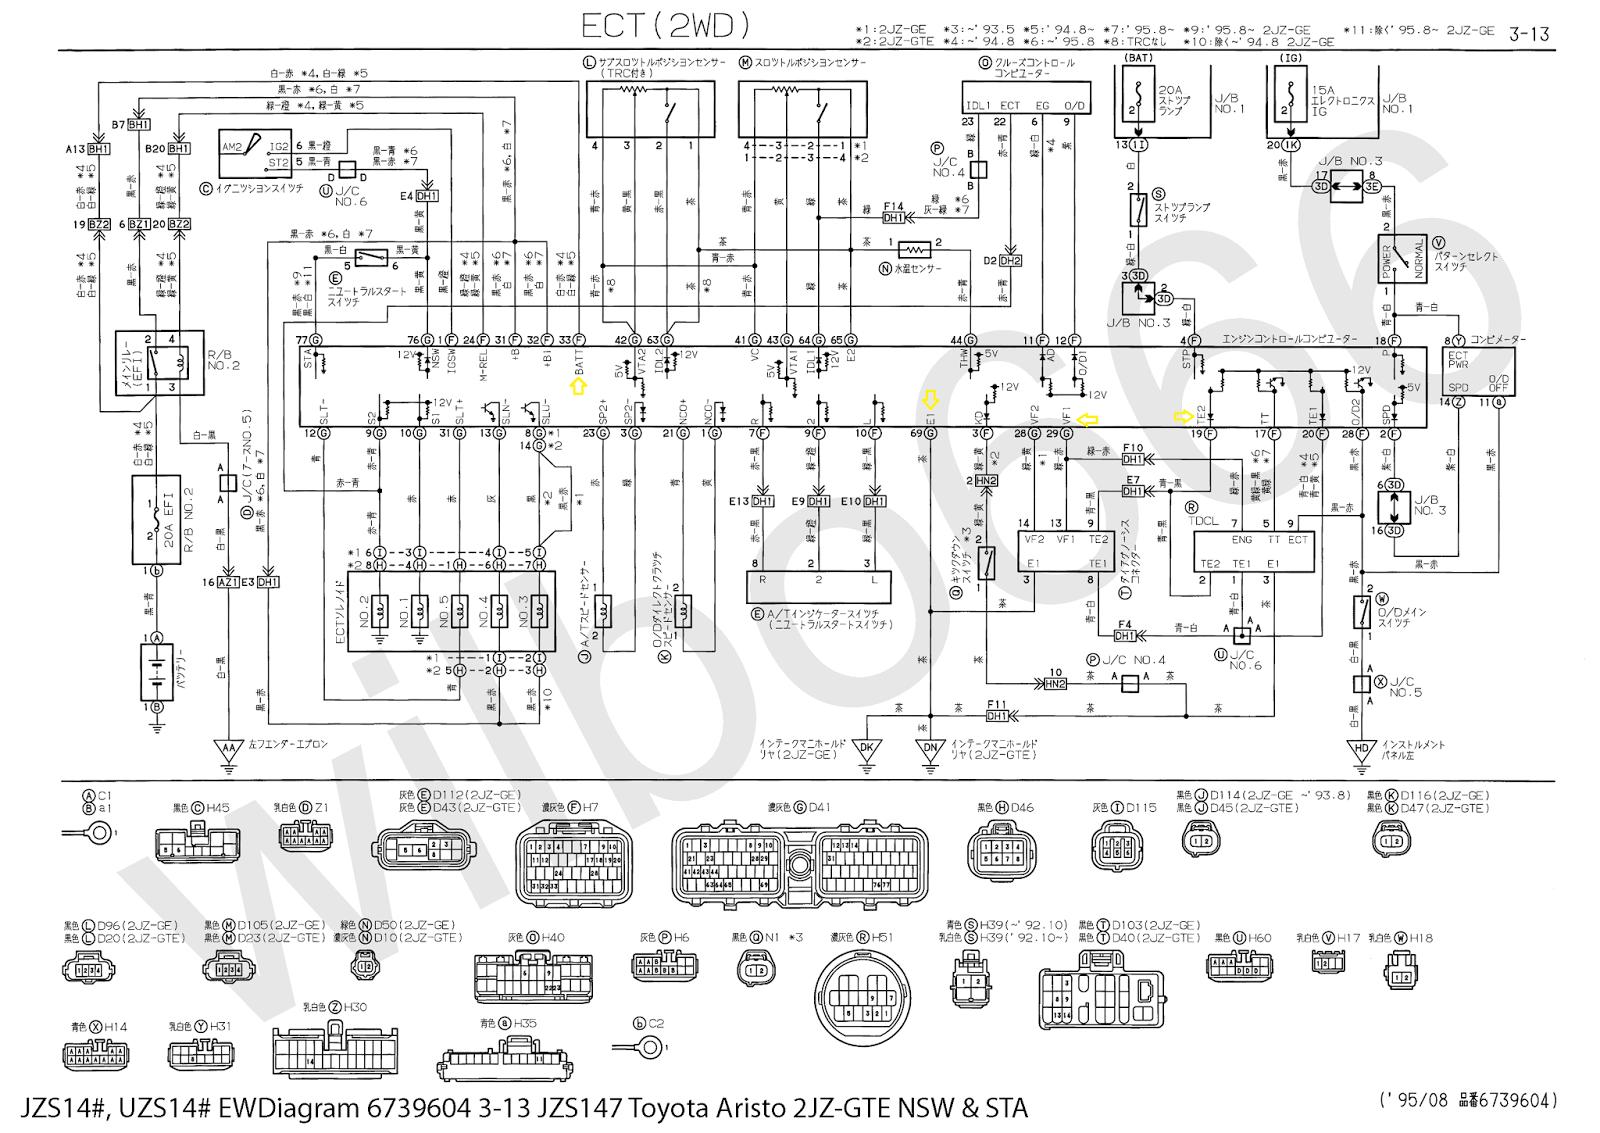 aristo vvt i ecu pinout wiring diagram